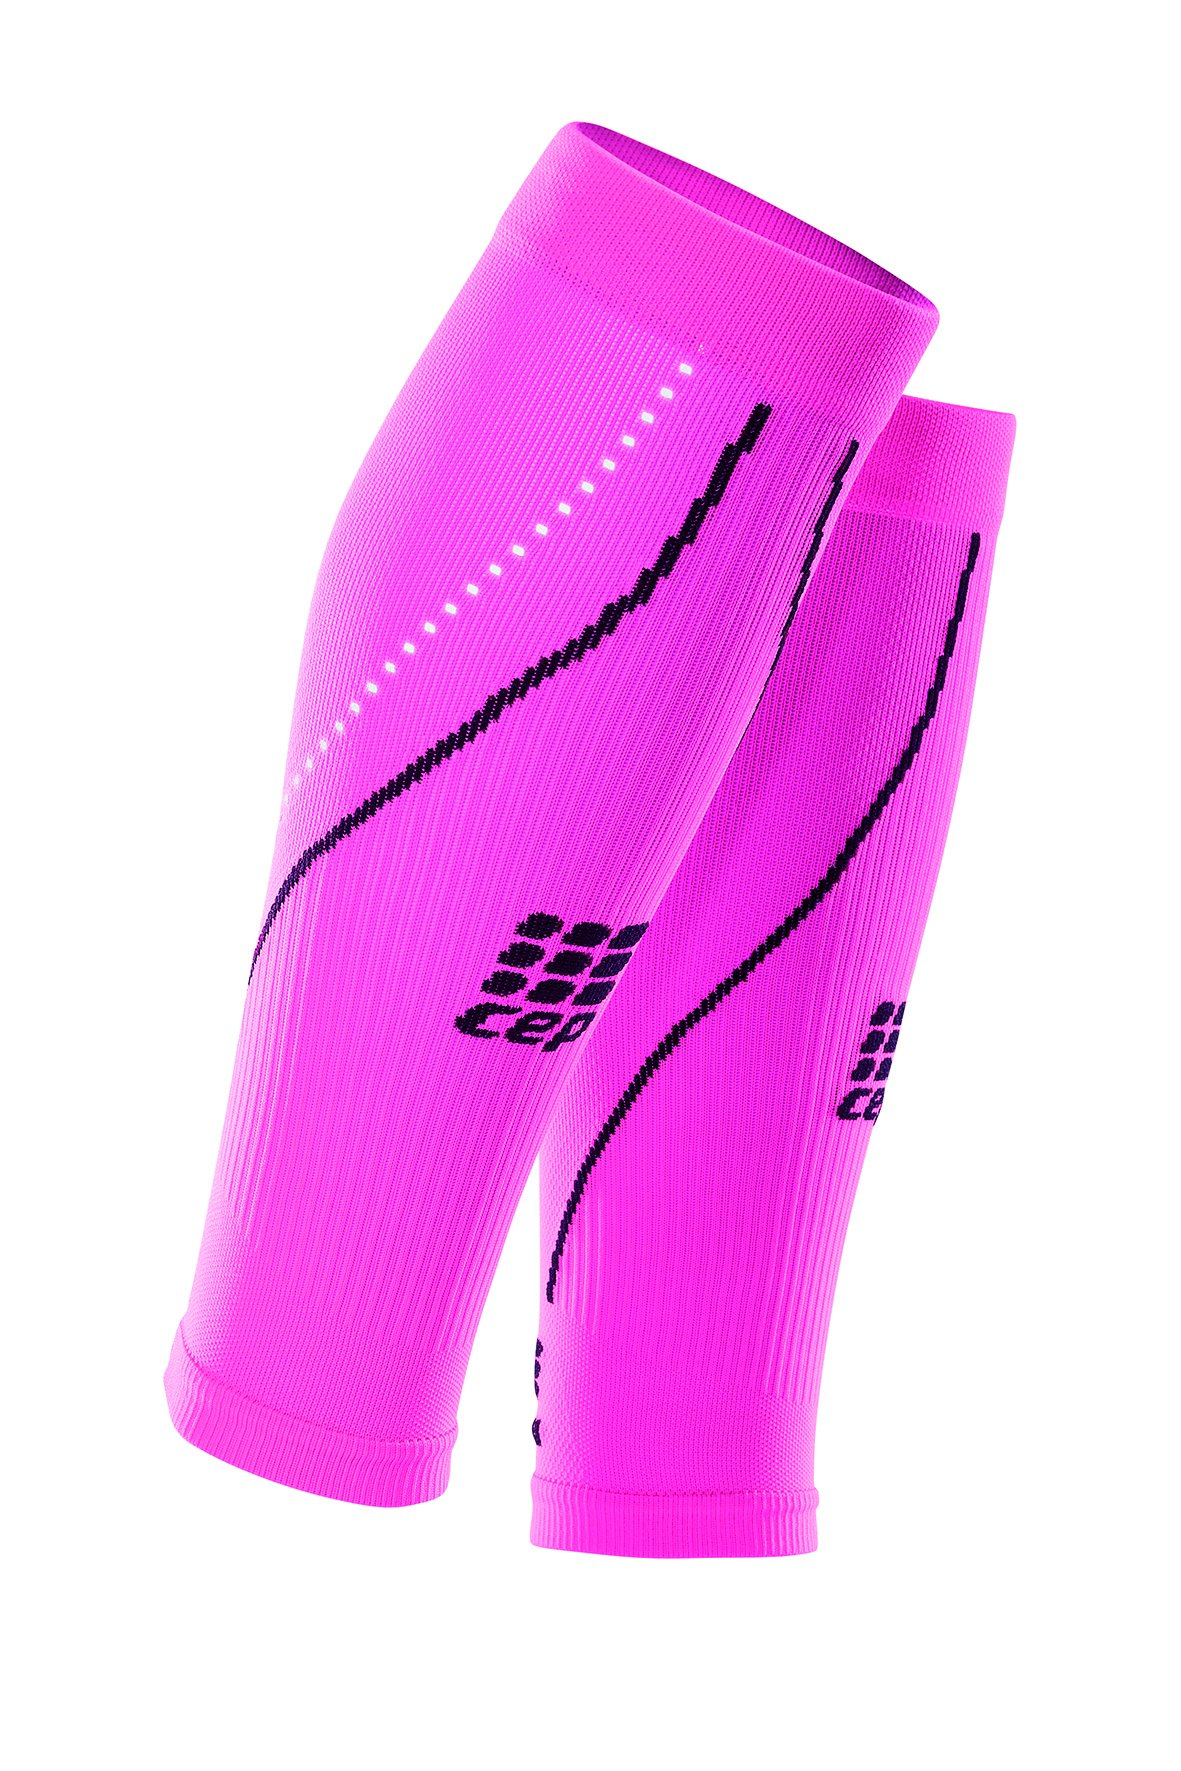 CEP Progressive+ Night Compression Calf Sleeves 2.0, Flash Pink/Black, Women, Size 4